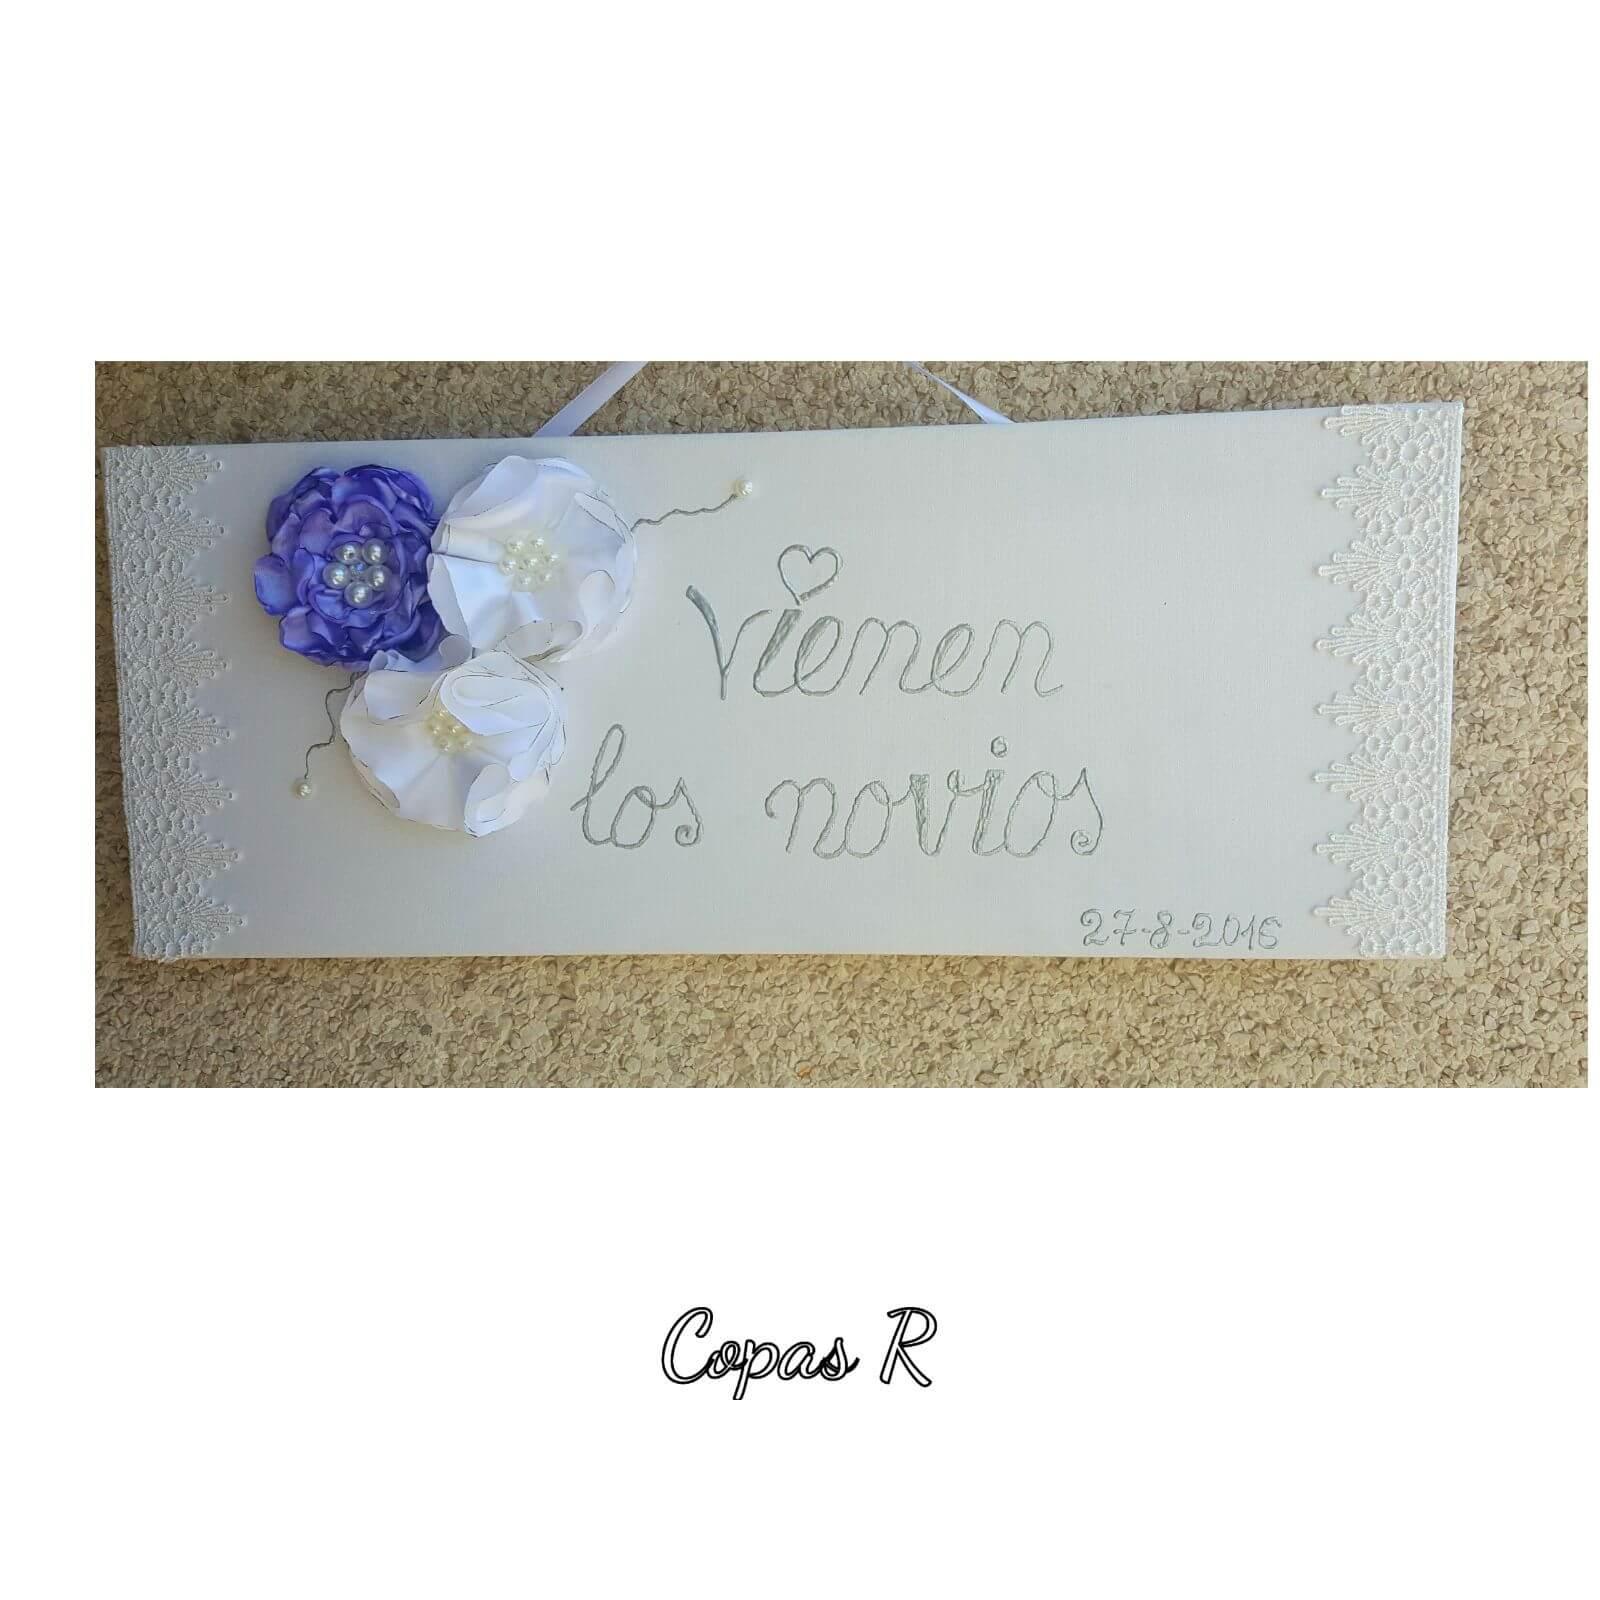 carteles boda carteles boda - carteles boda 5 - Carteles boda